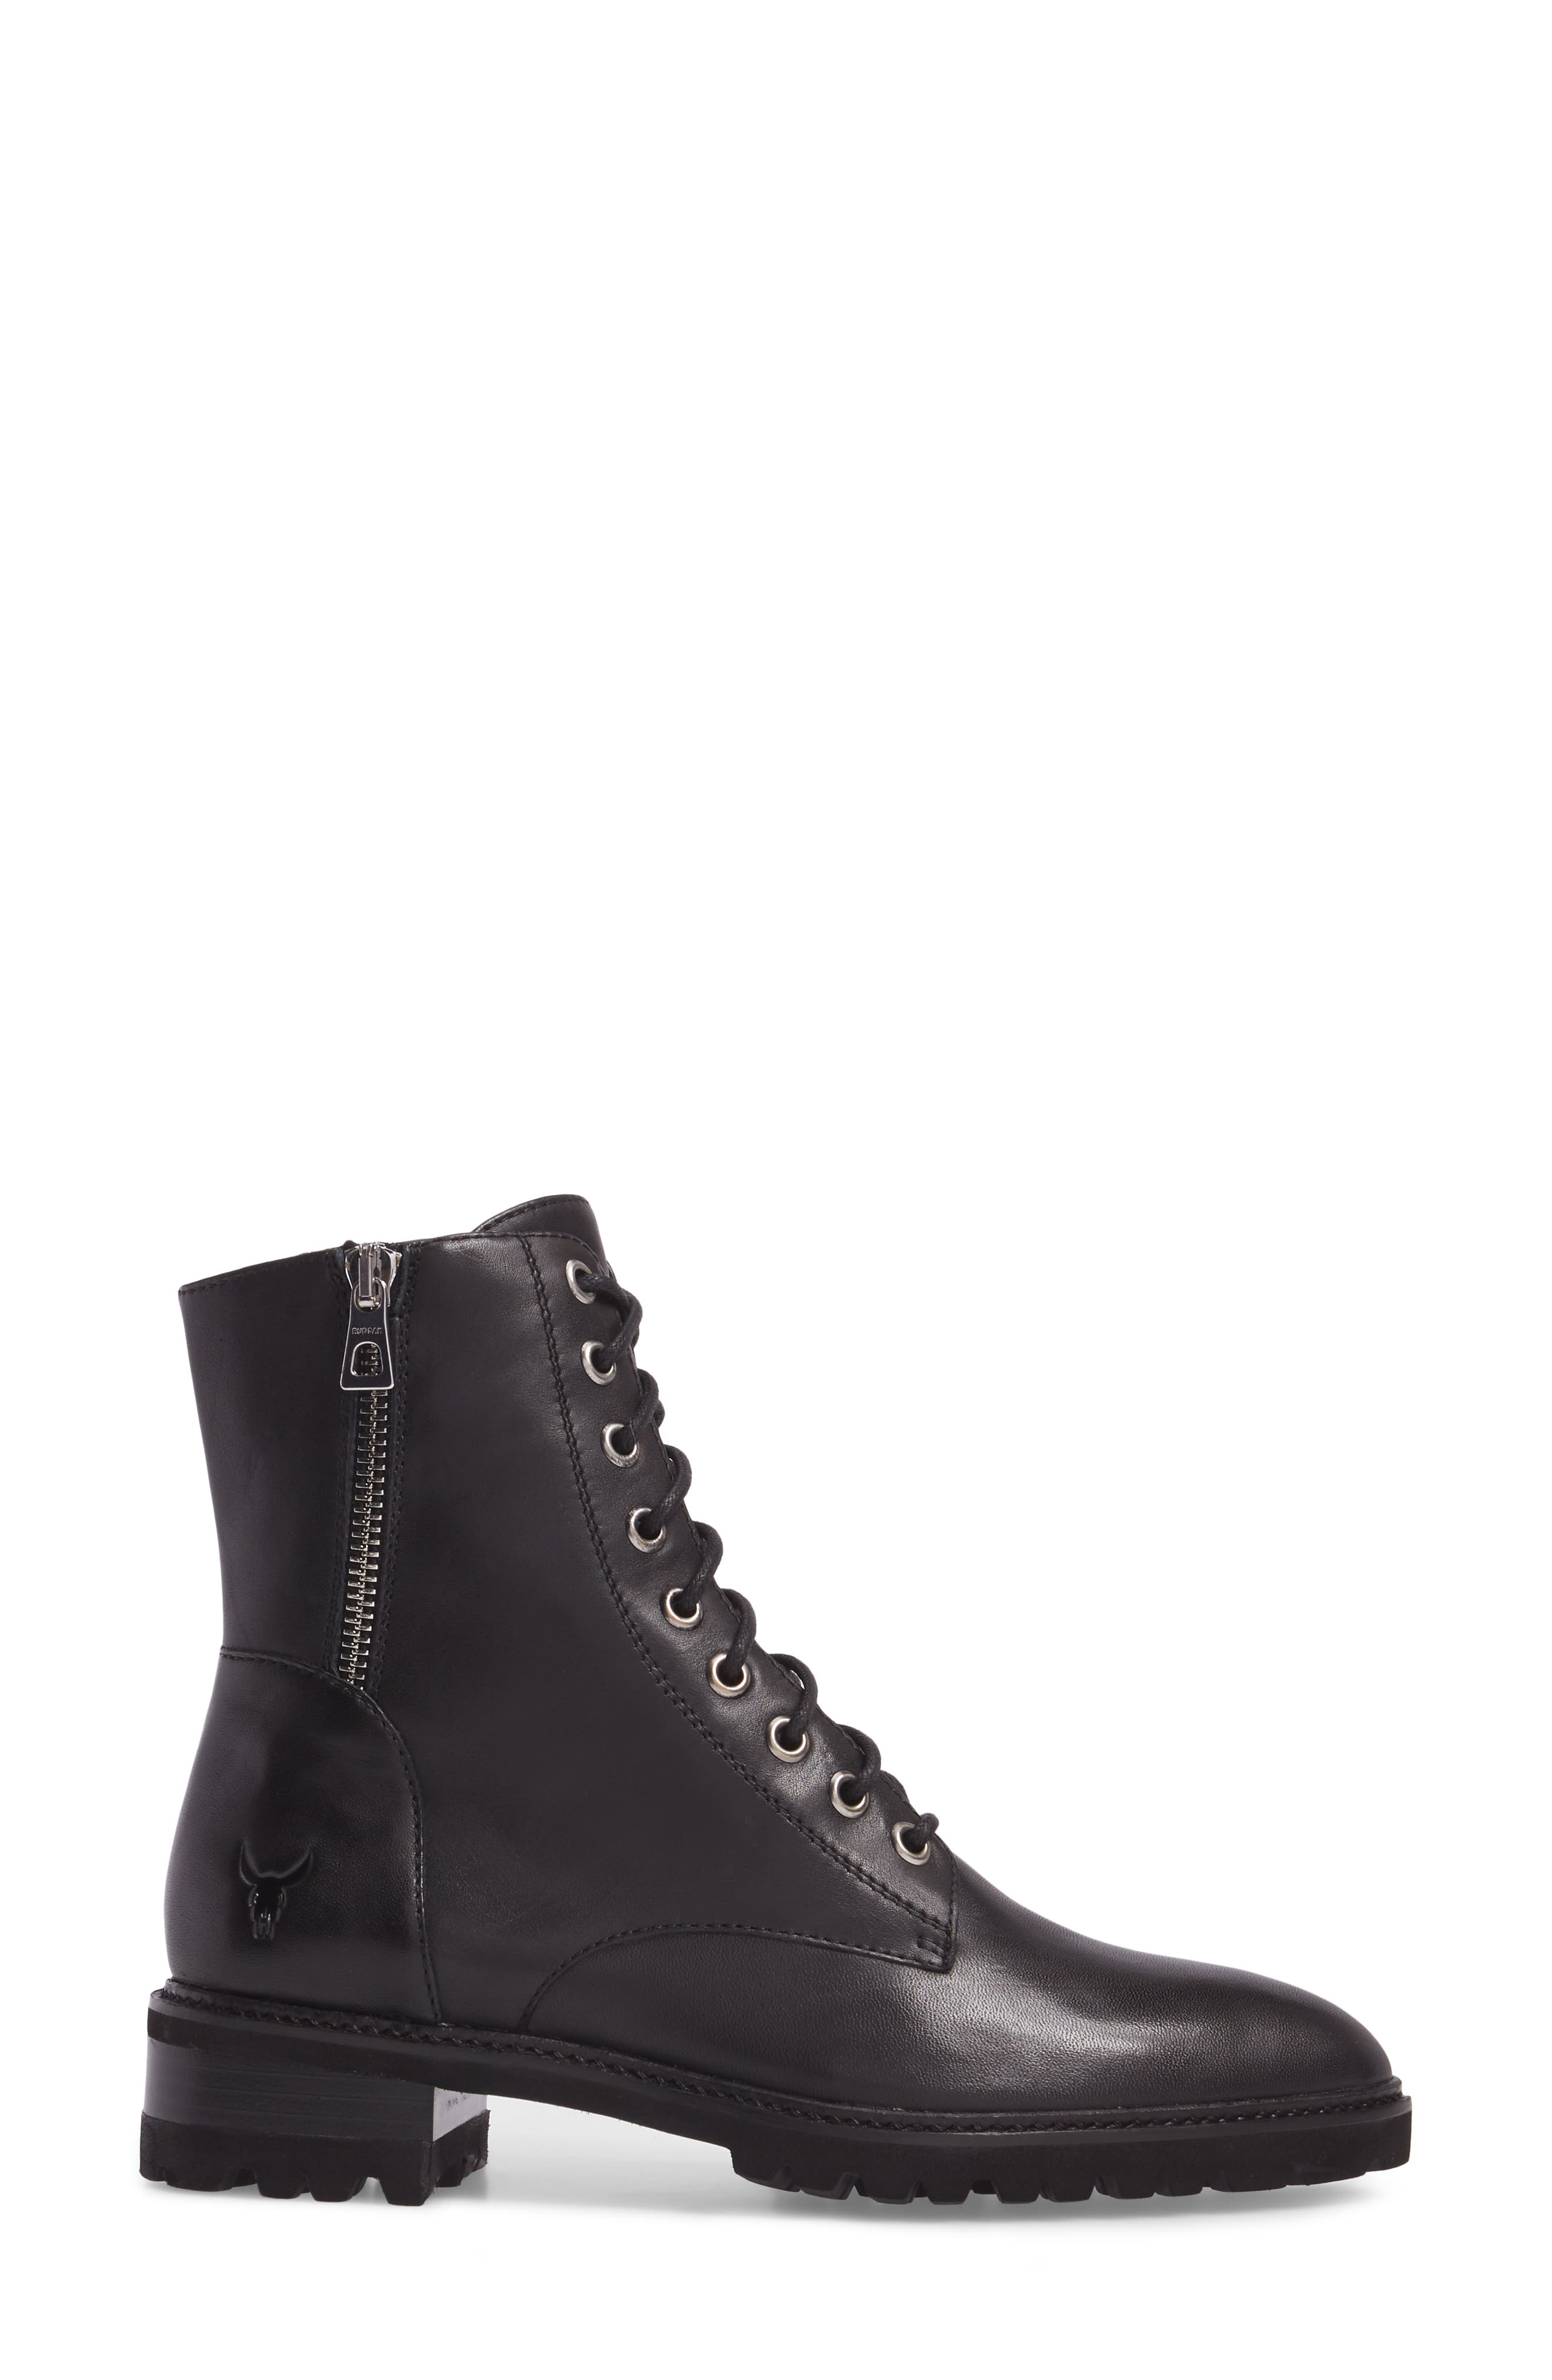 Tempt Boot,                             Alternate thumbnail 3, color,                             Black Leather